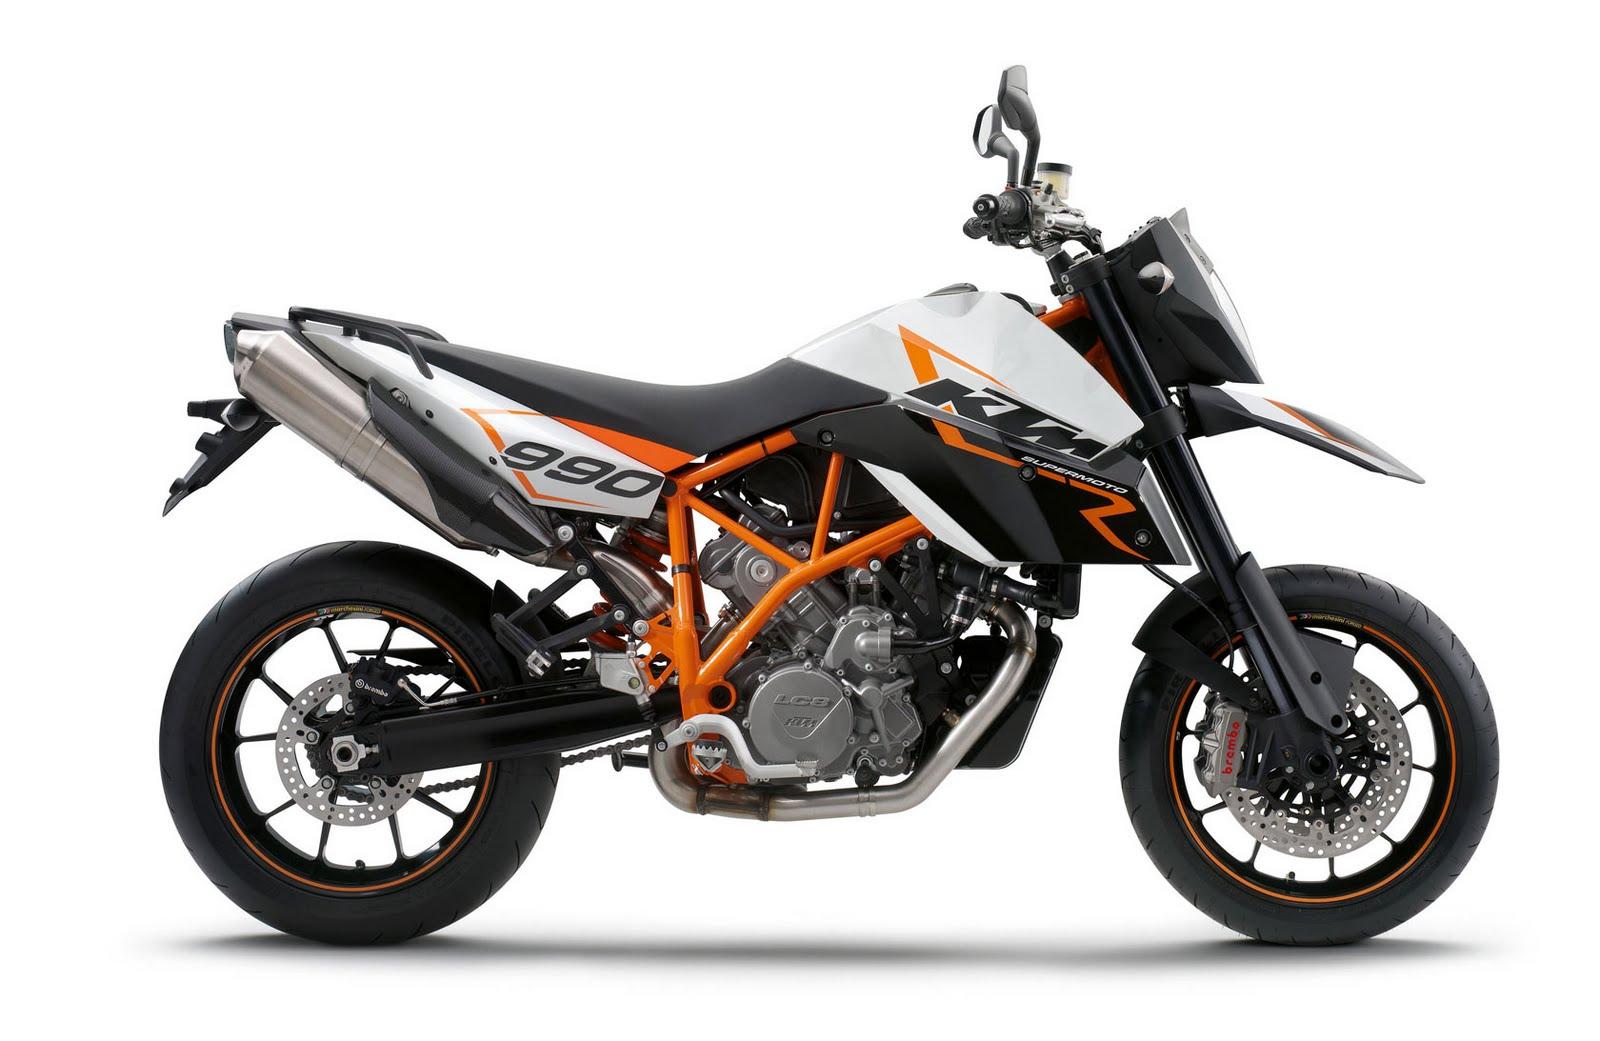 top motorcycle 2009 ktm 990 supermoto r. Black Bedroom Furniture Sets. Home Design Ideas